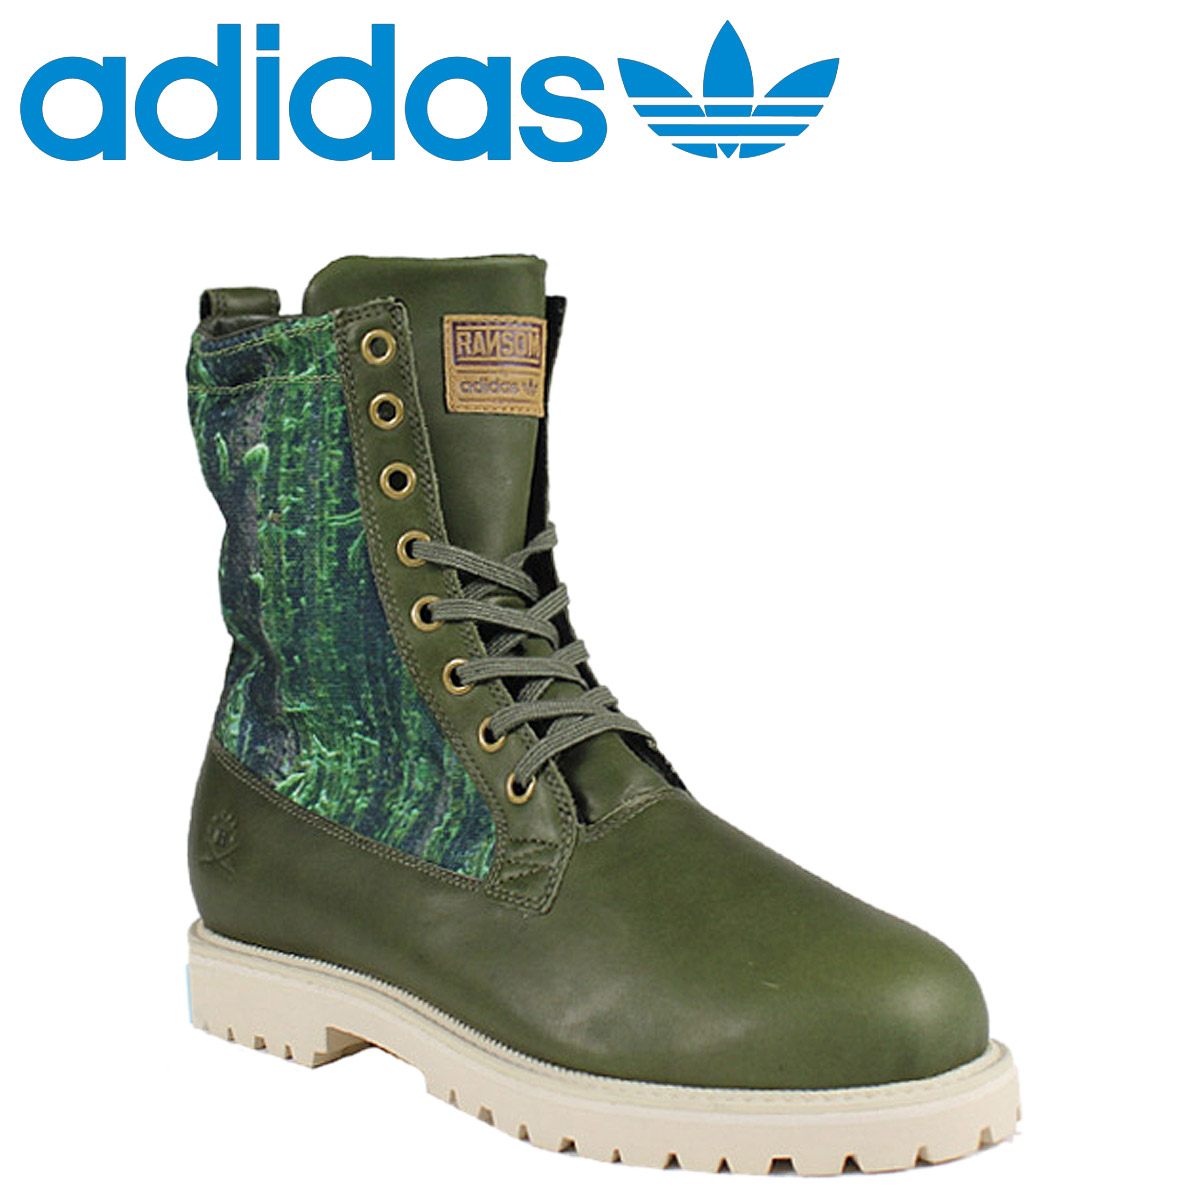 adidas Originals アディダス オリジナルス ブーツ RANSOM MESA GTX 海外限定 G50939 メンズ 靴 グリーン